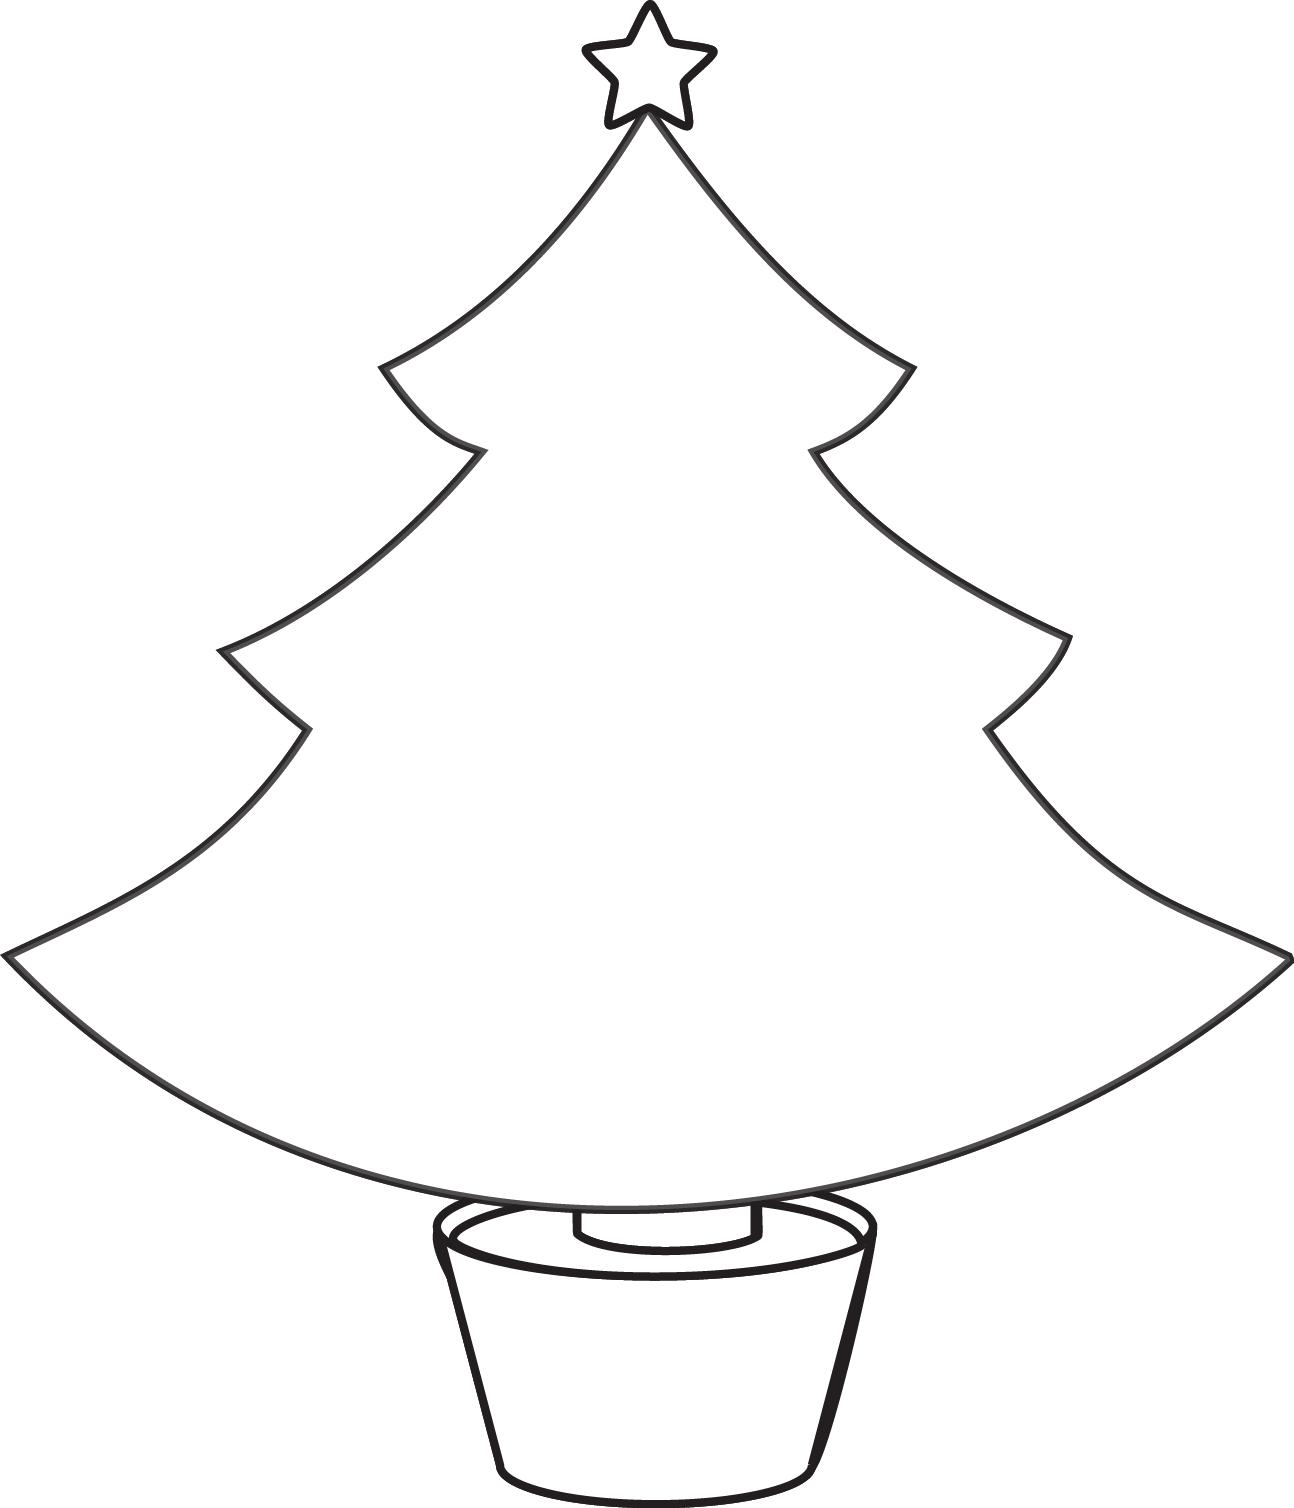 photograph relating to Christmas Tree Cutouts Printable identified as Xmas Tree Stencil Printable. Totally free Printable Xmas